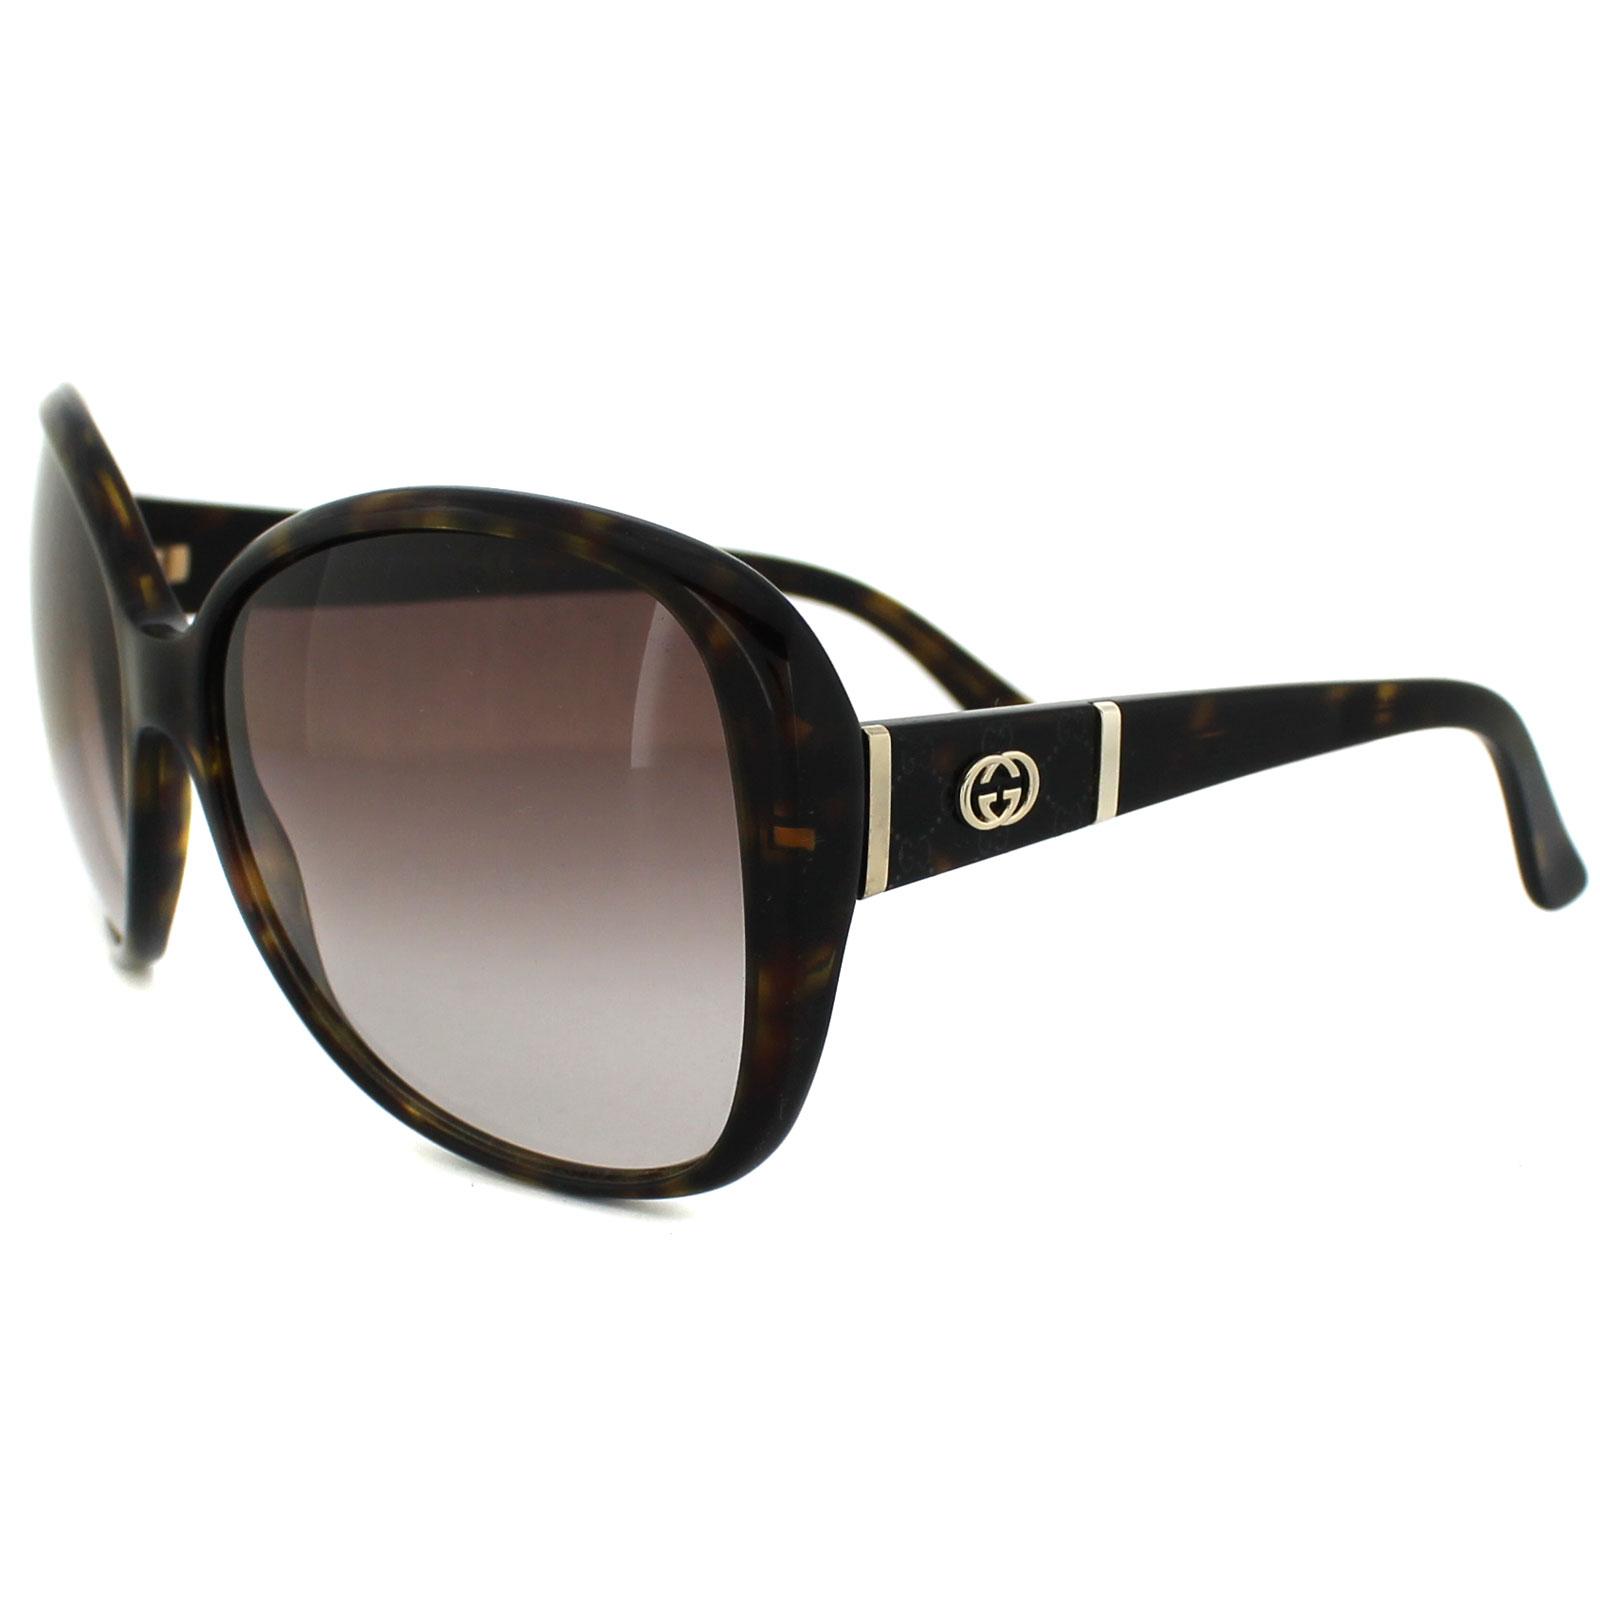 gucci sonnenbrille 3126 086 s2 dark havana brown gradient. Black Bedroom Furniture Sets. Home Design Ideas